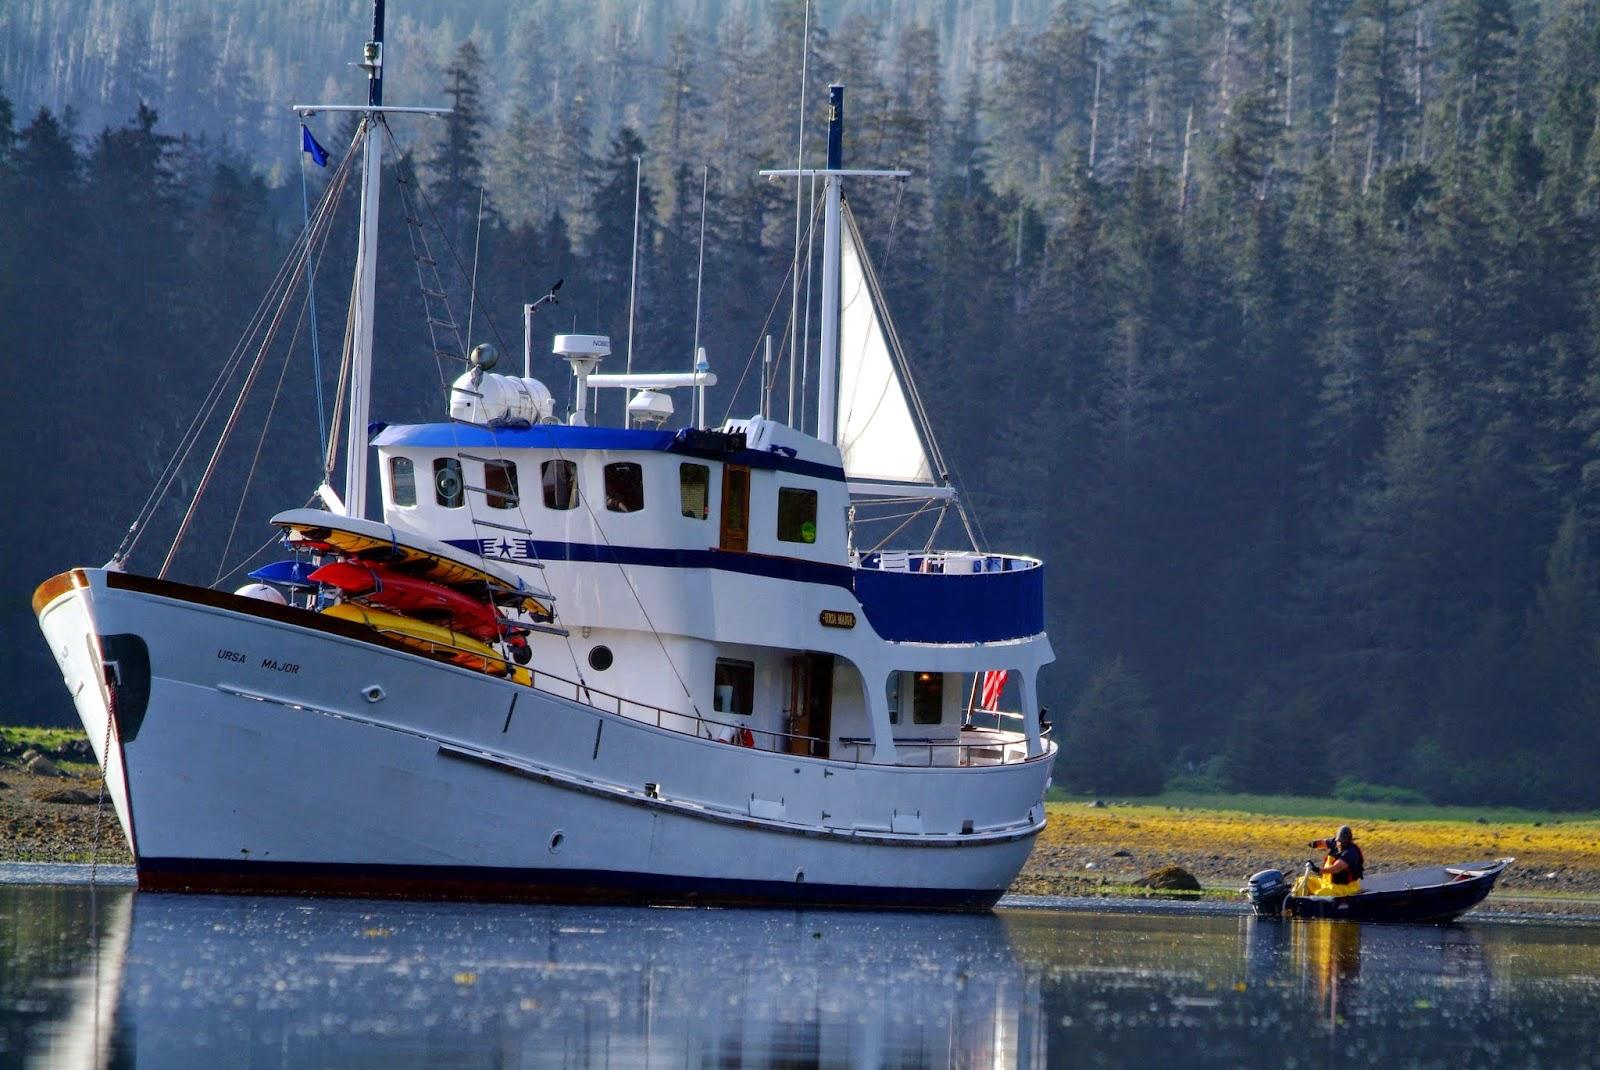 Ursa Major is returning to Alaska in 2015!